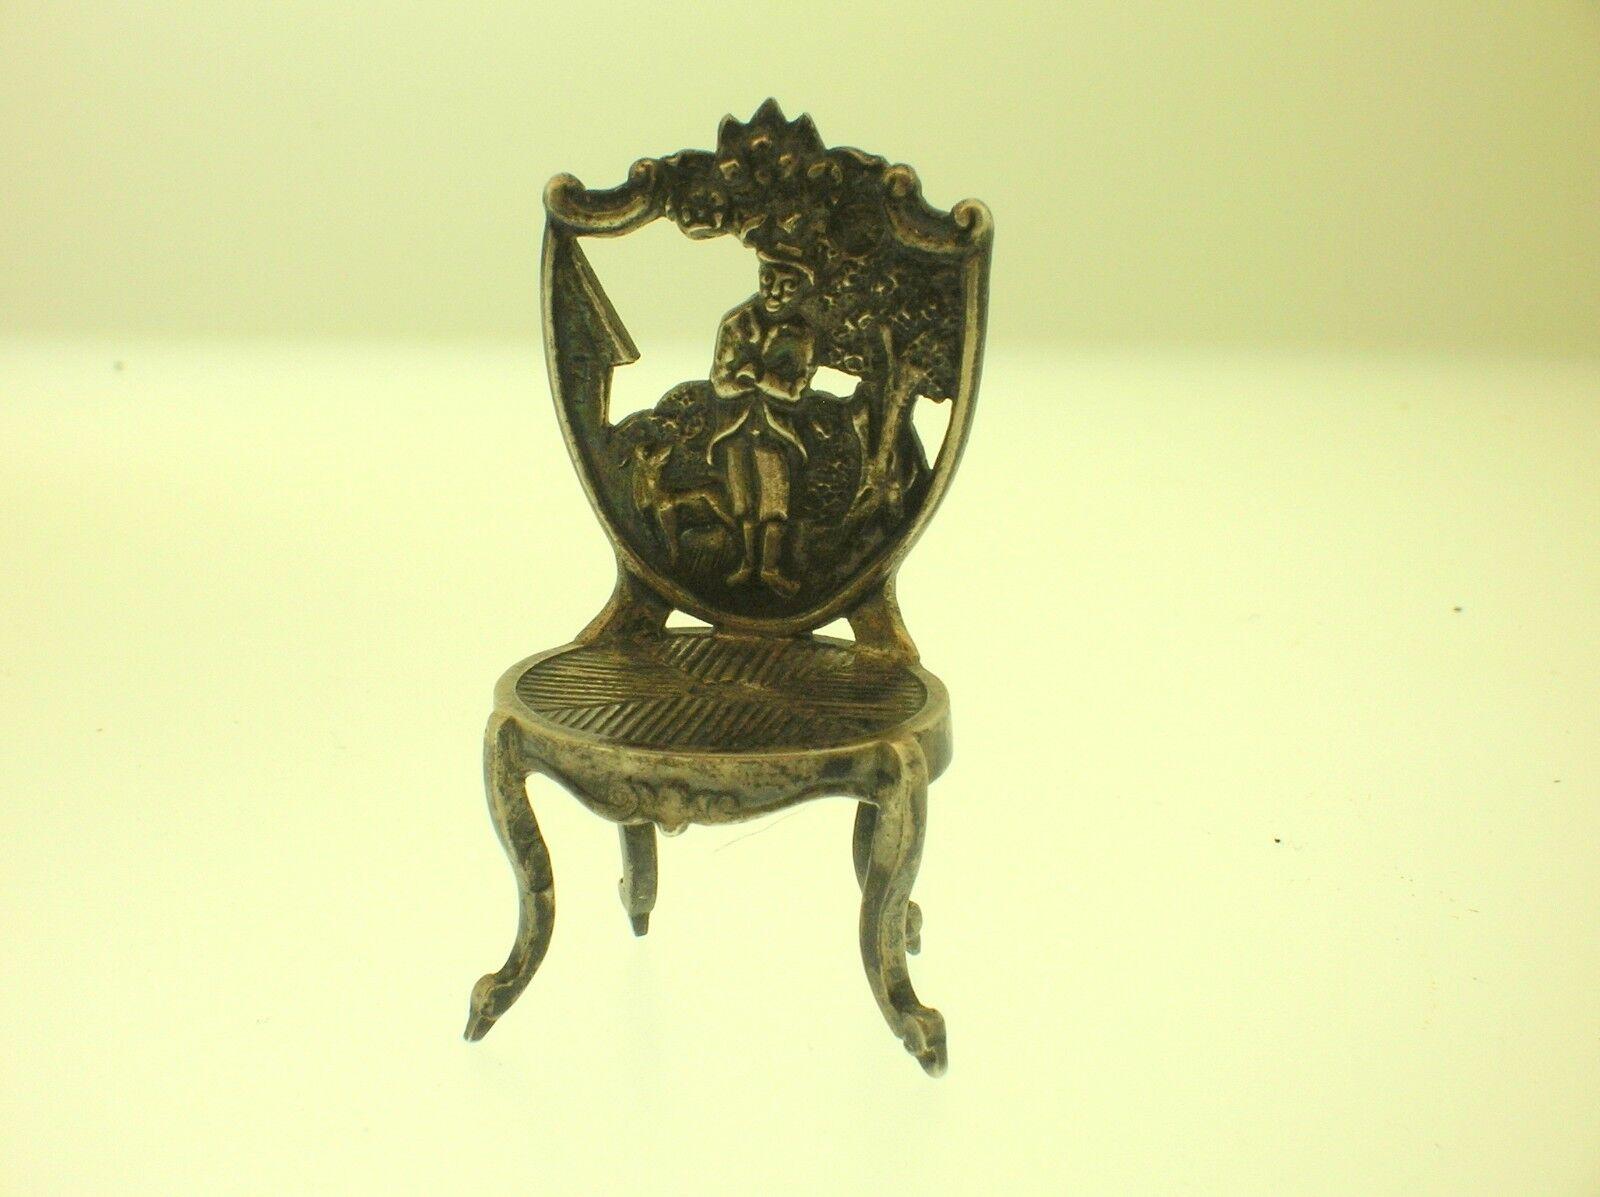 1895 DUTCH STERLING Silber DOLL HOUSE MINIATURE CHAIR - HALLMARKED - 49MM - B O